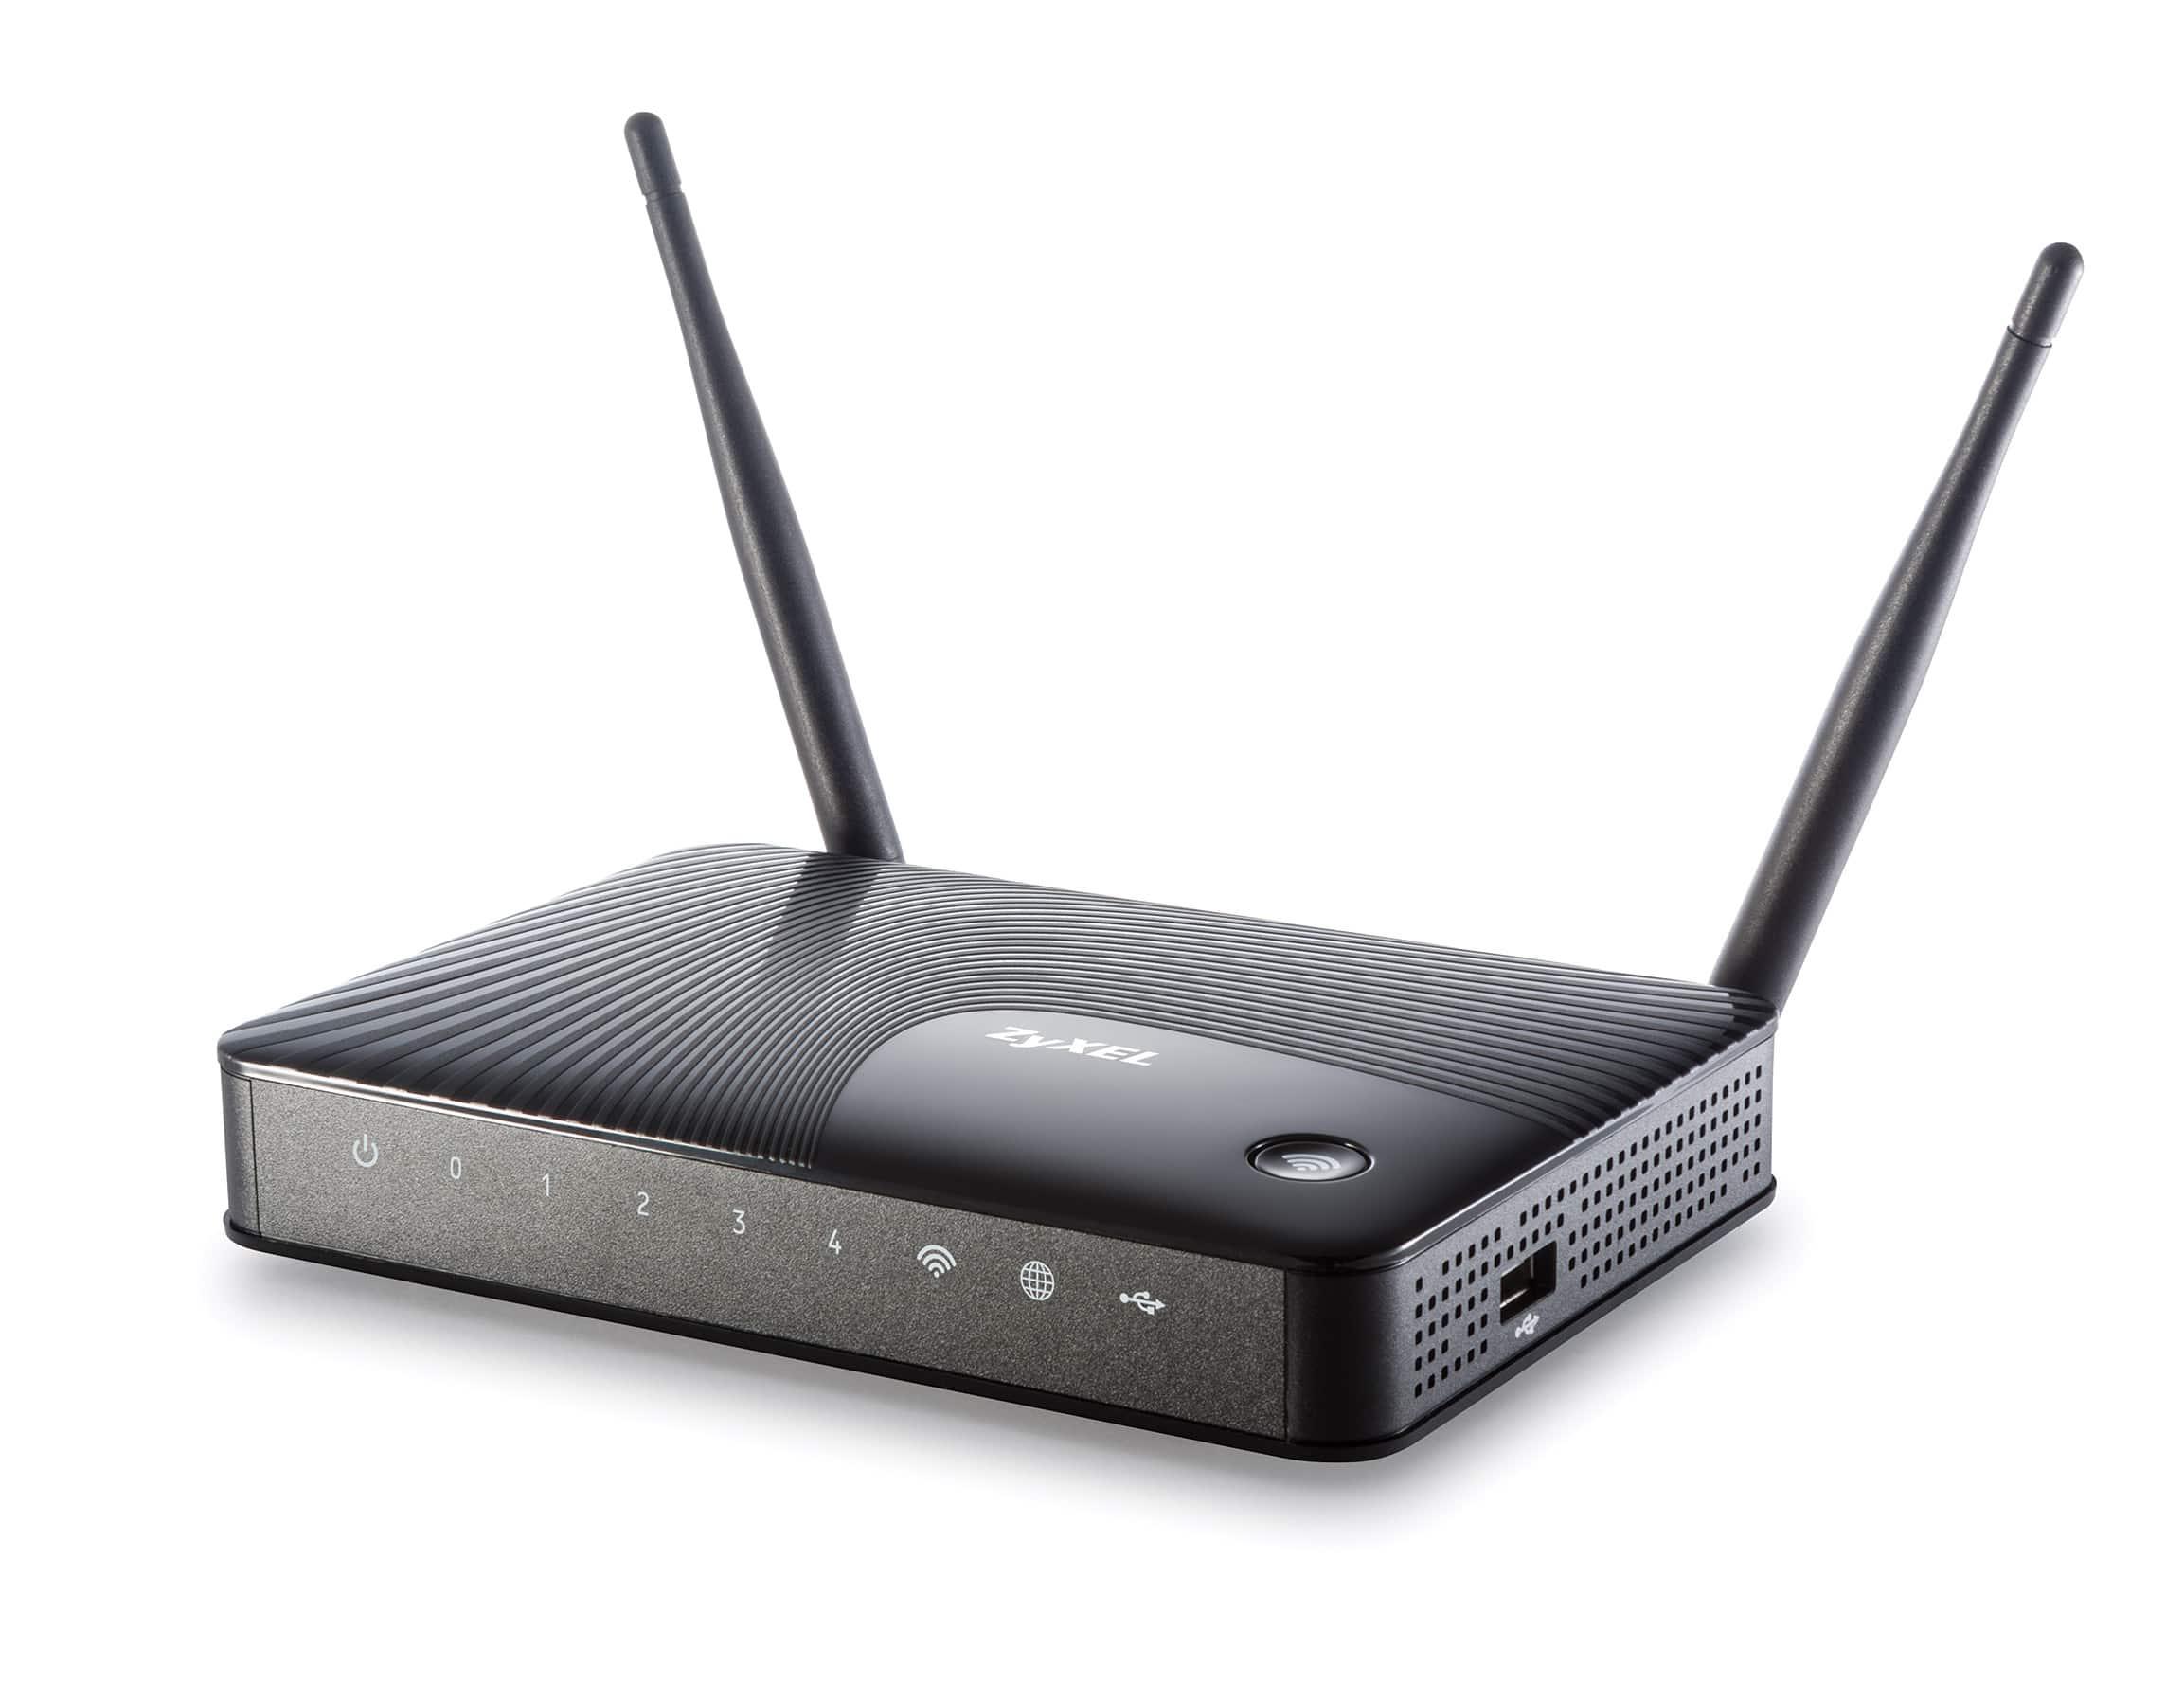 Роутеры Wi-Fi негативно влияют на организм человека